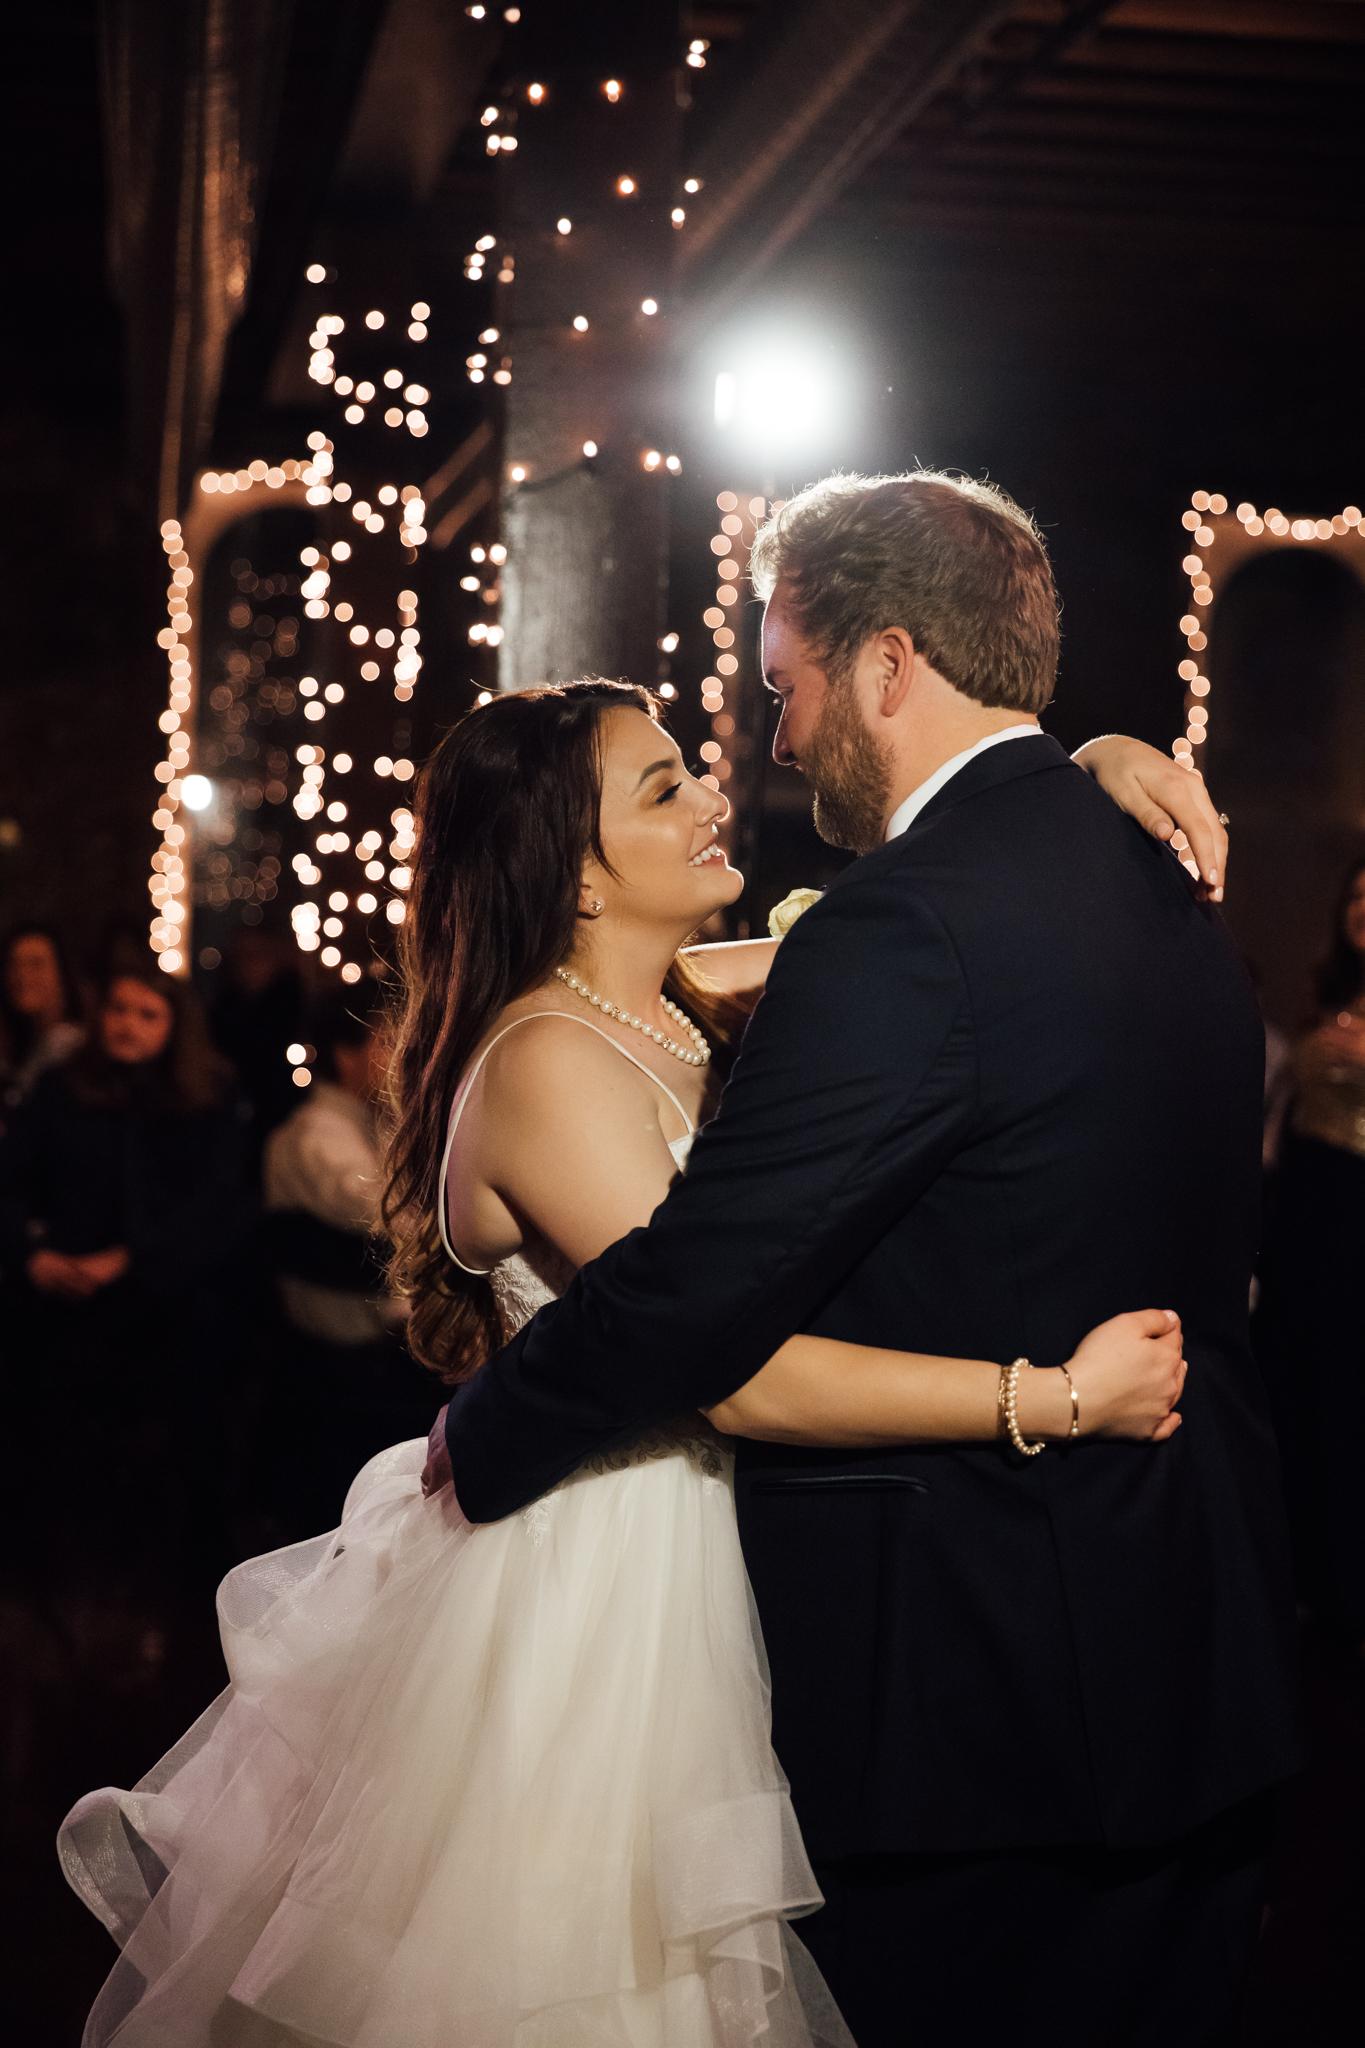 memphis-wedding-photographers-thewarmtharoundyou-ballinese-ballroom (201 of 232).jpg